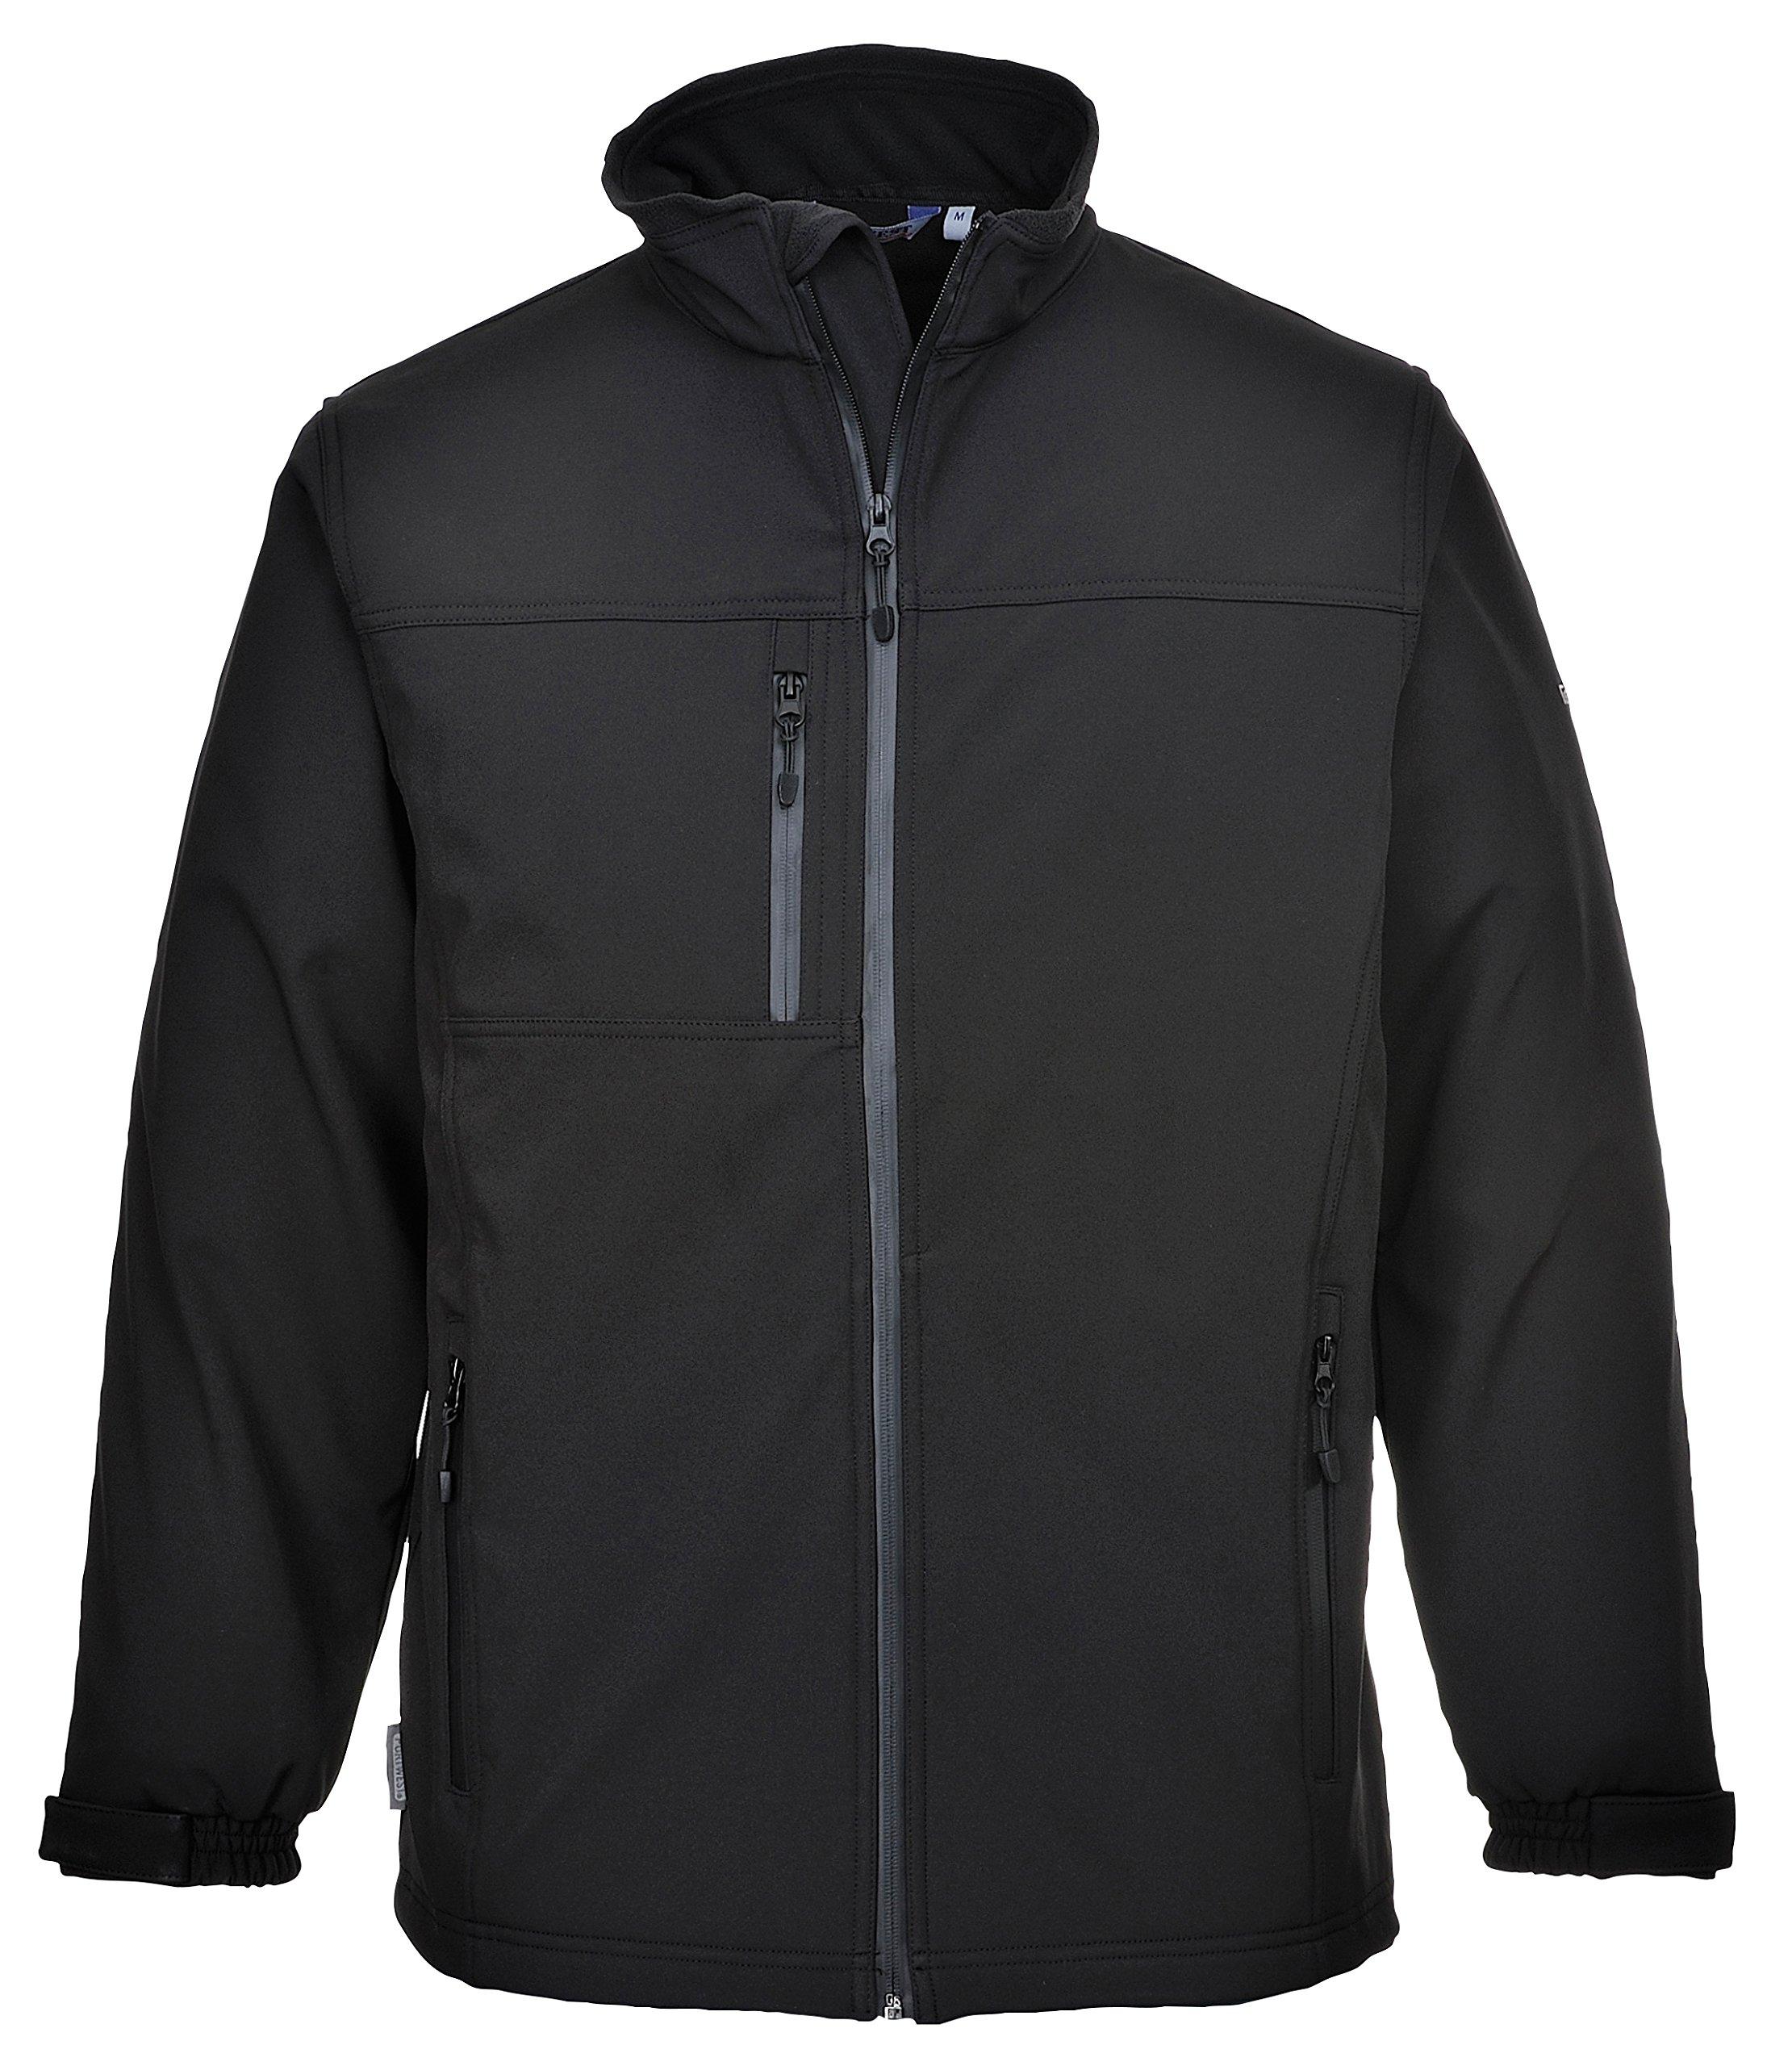 Portwest Softshell Jacket Windproof Waterproof Breathable Outdoor Coat (L, Black)